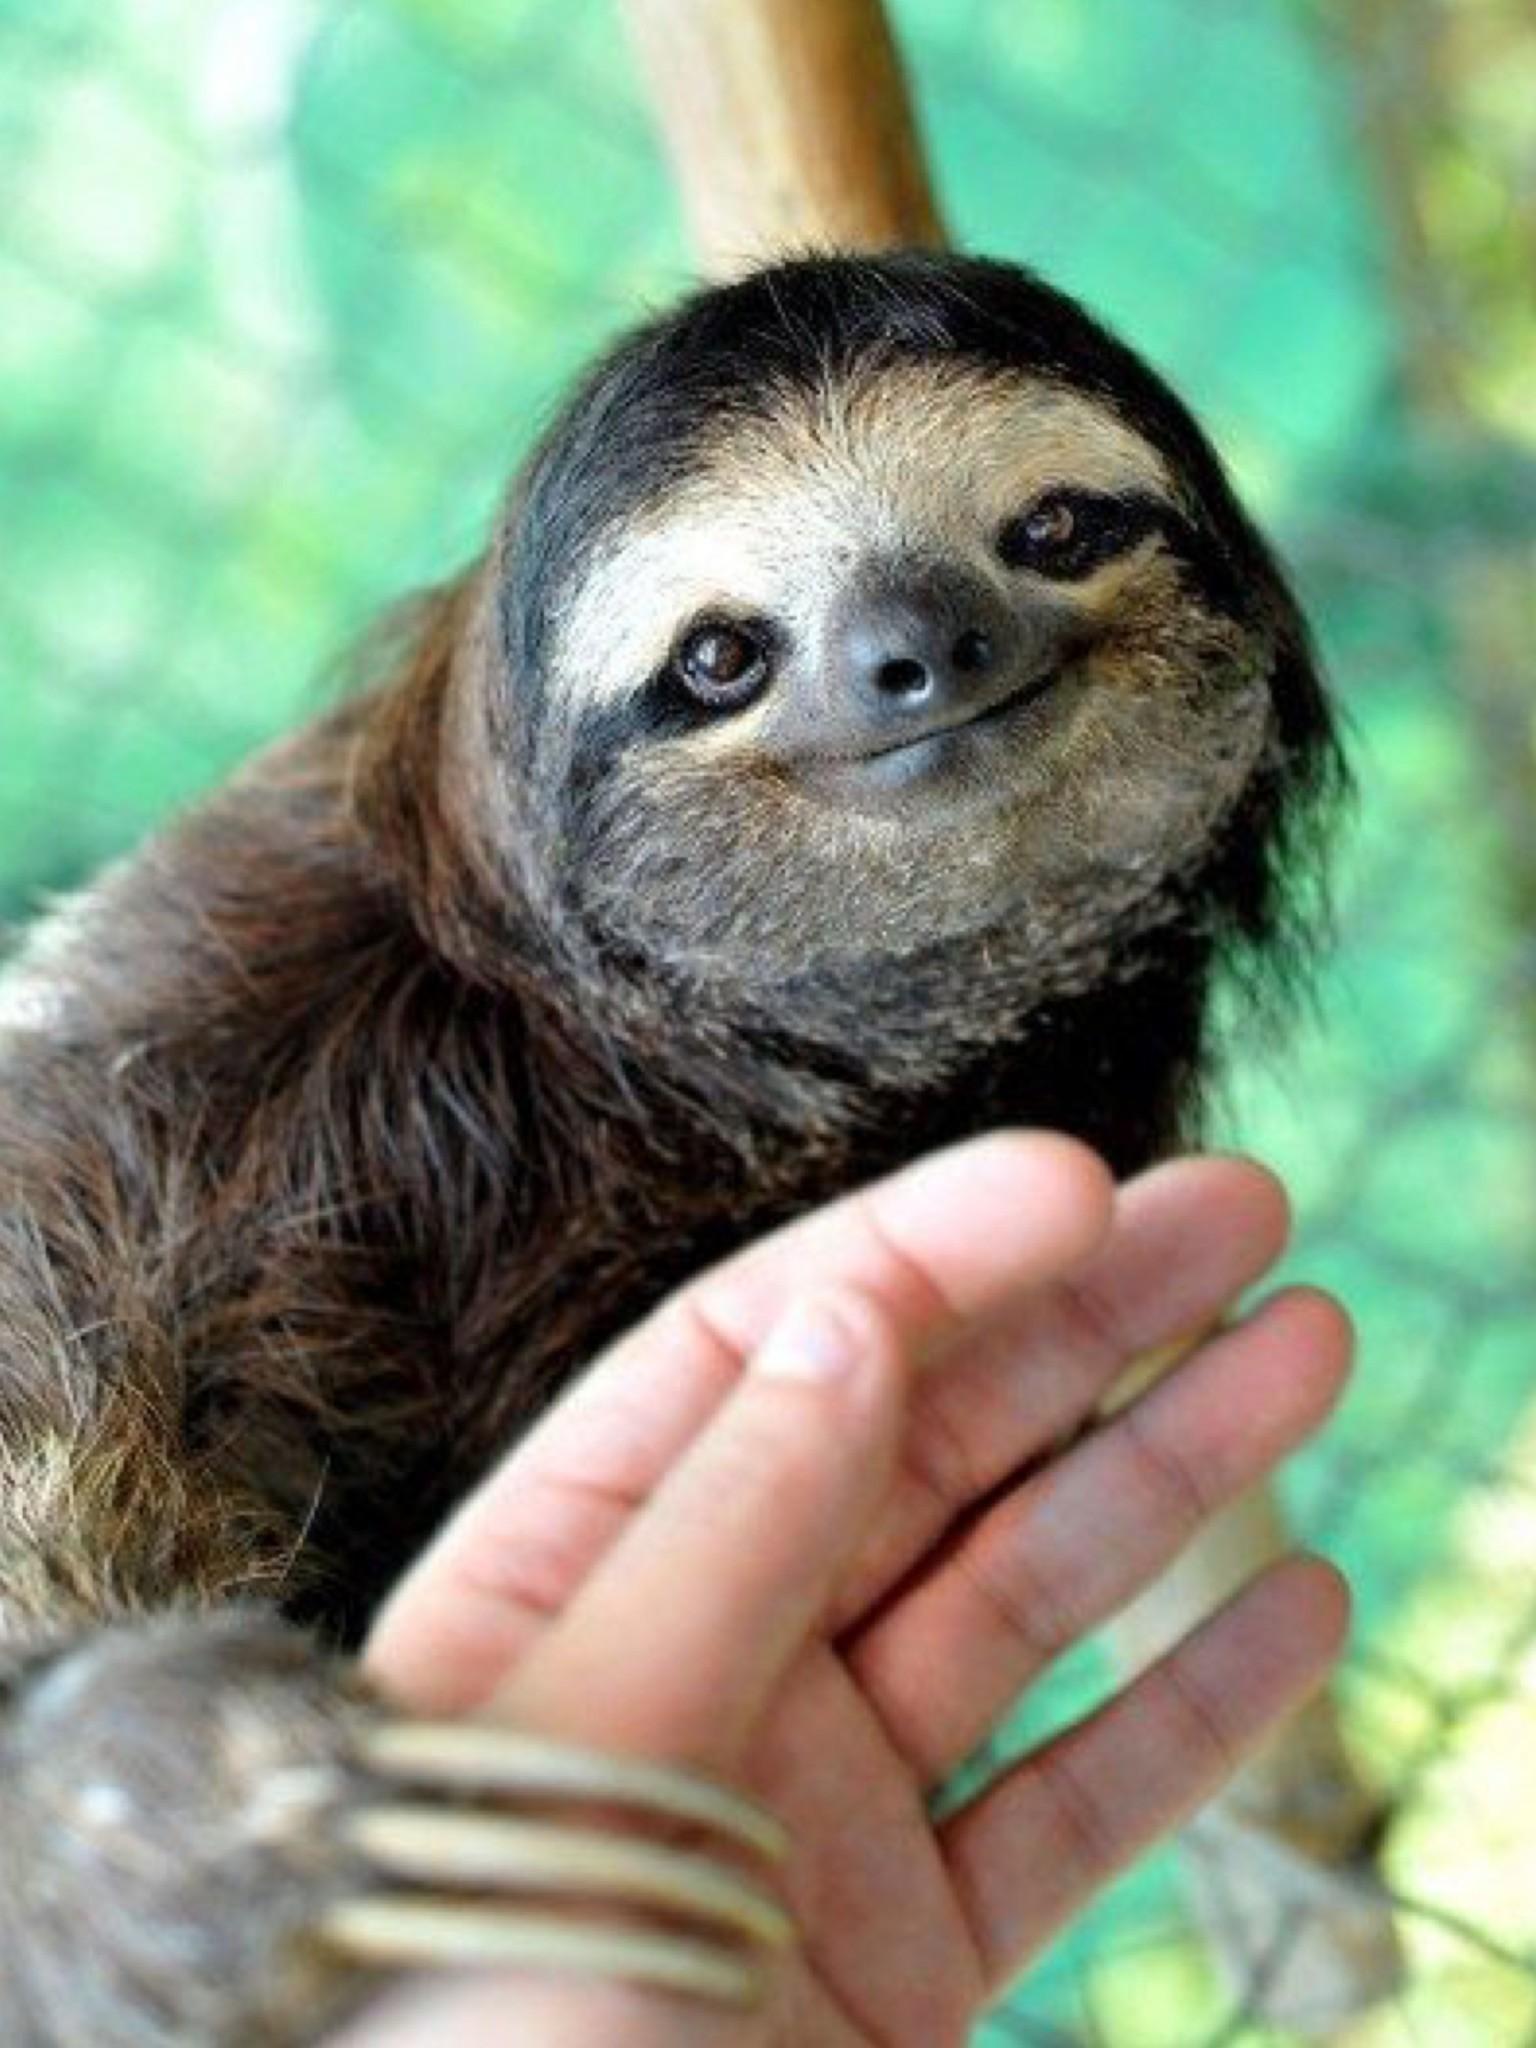 1536x2048 Sloth Wallpapers Fresh 15 Unbearably Cute Costa Rica Sloth 1536x2048 Wallpaper Teahub Io